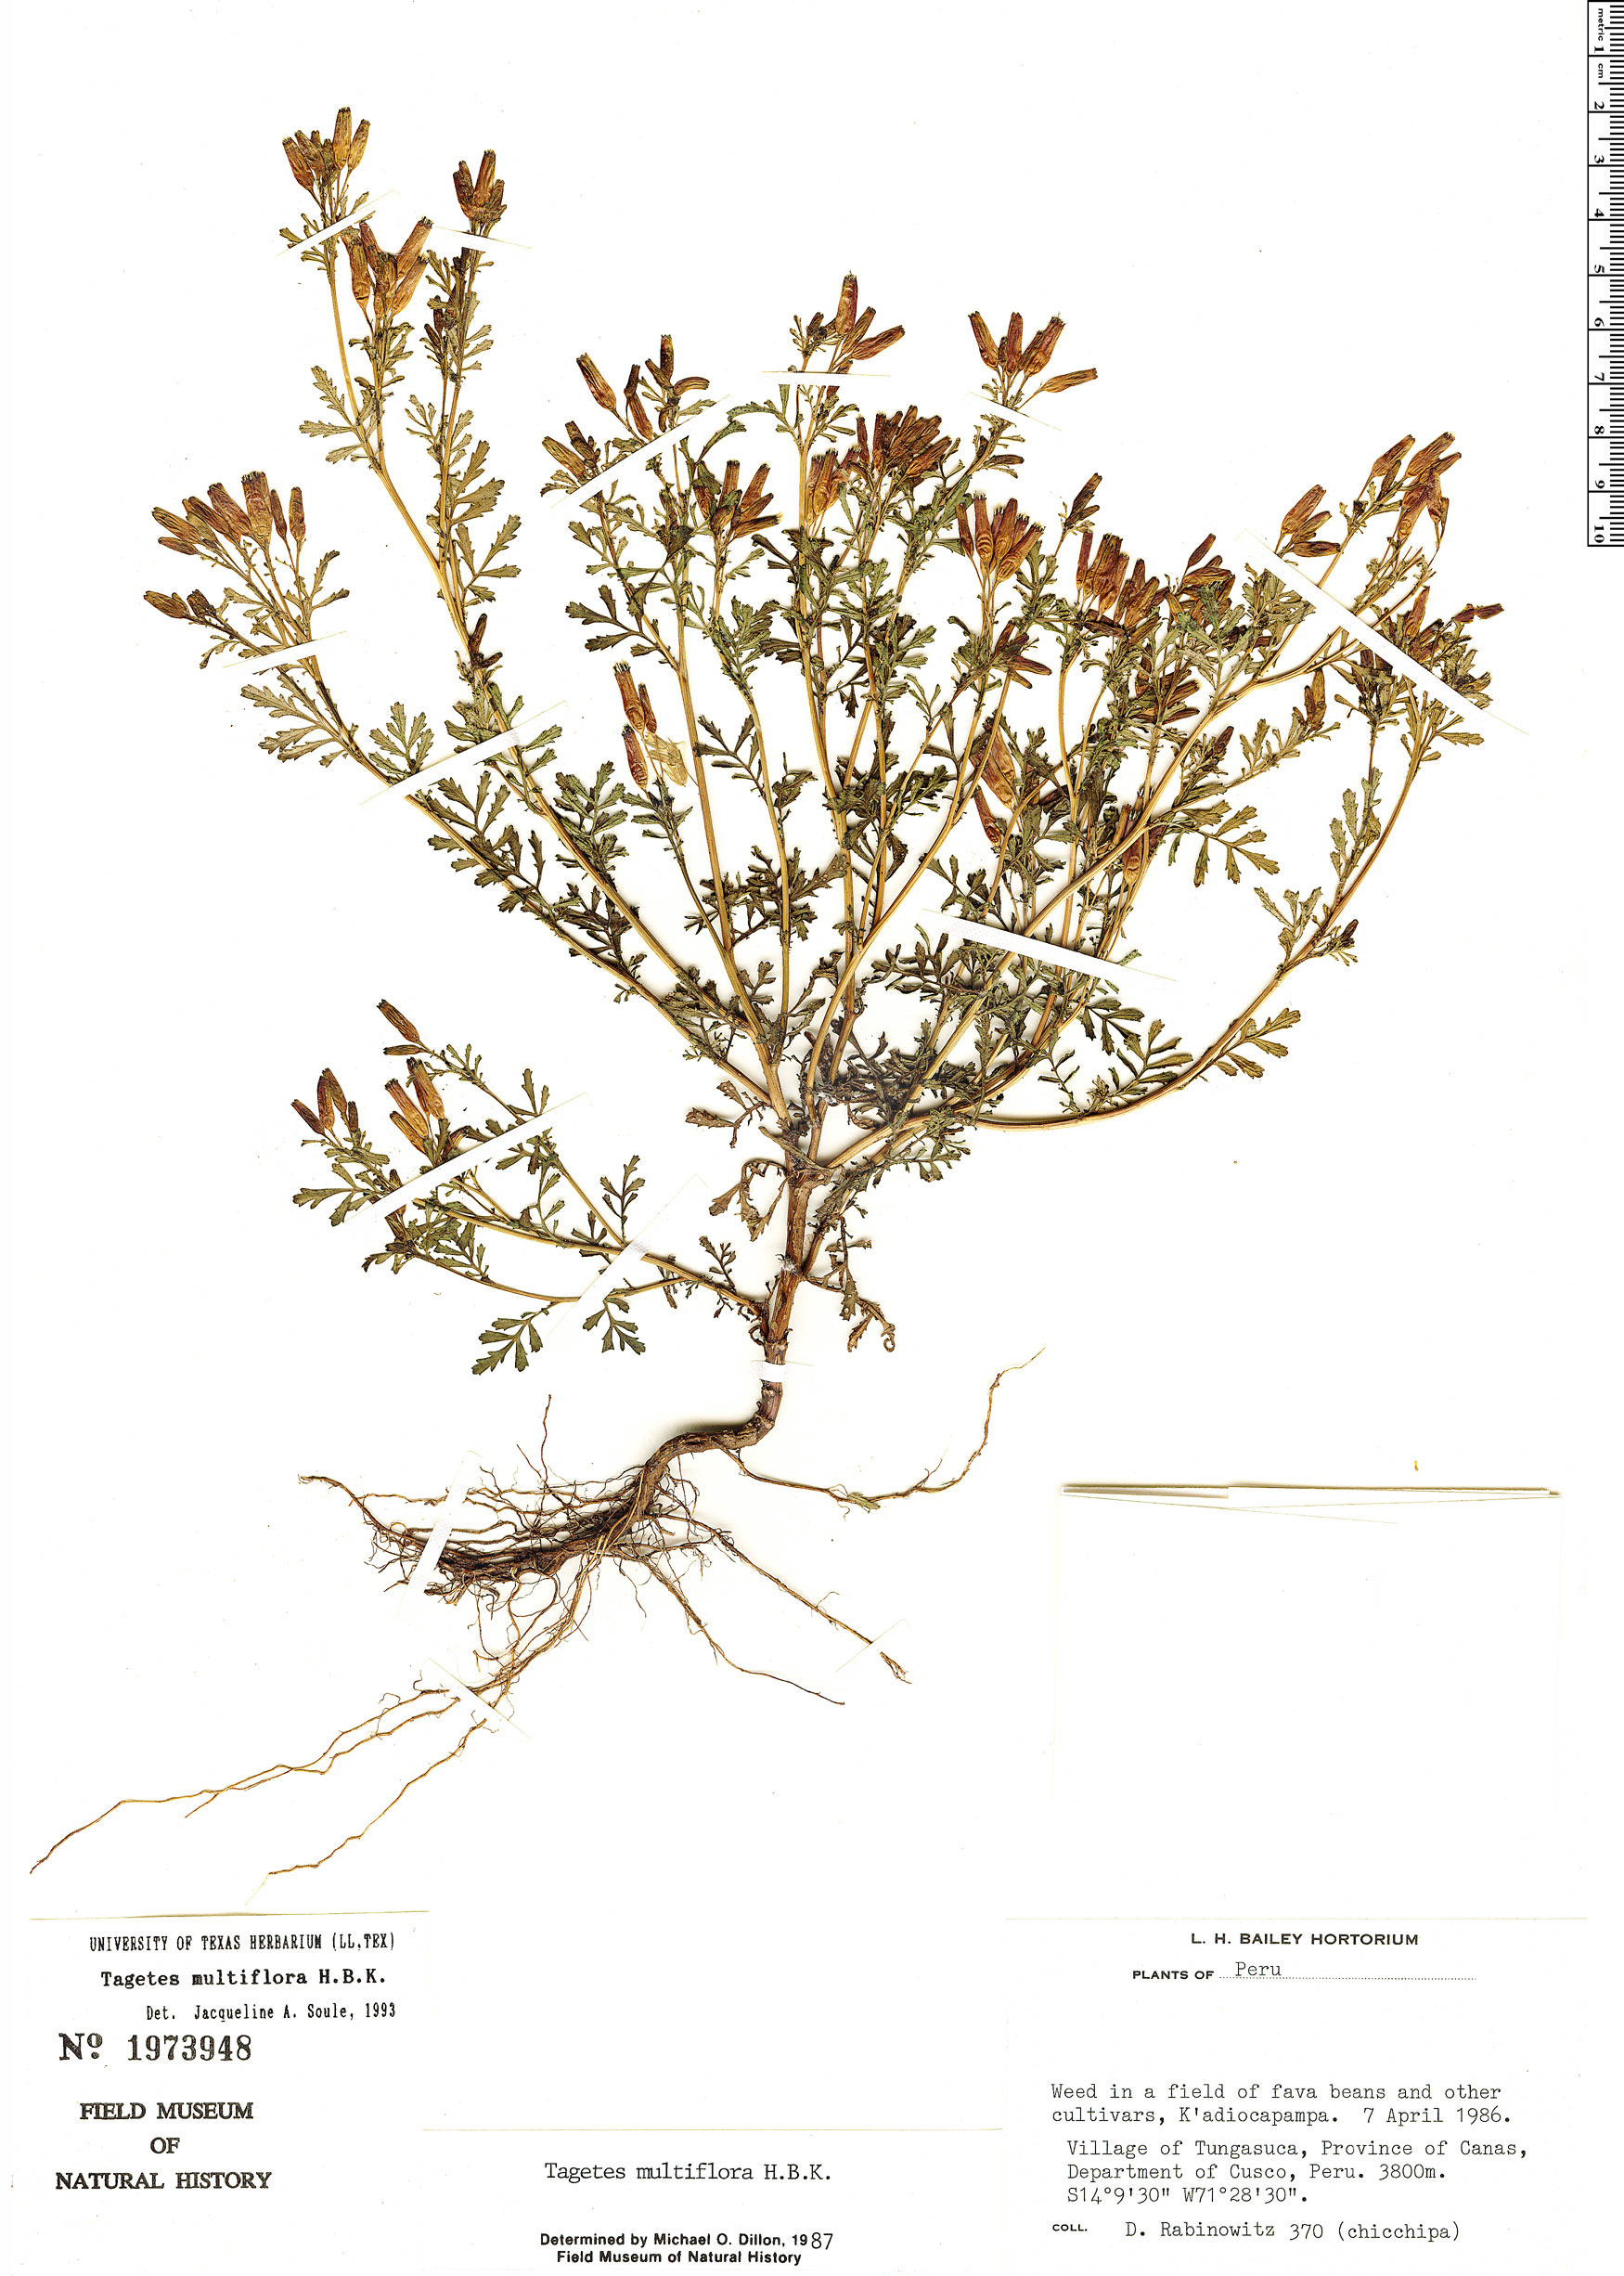 Espécime: Tagetes multiflora